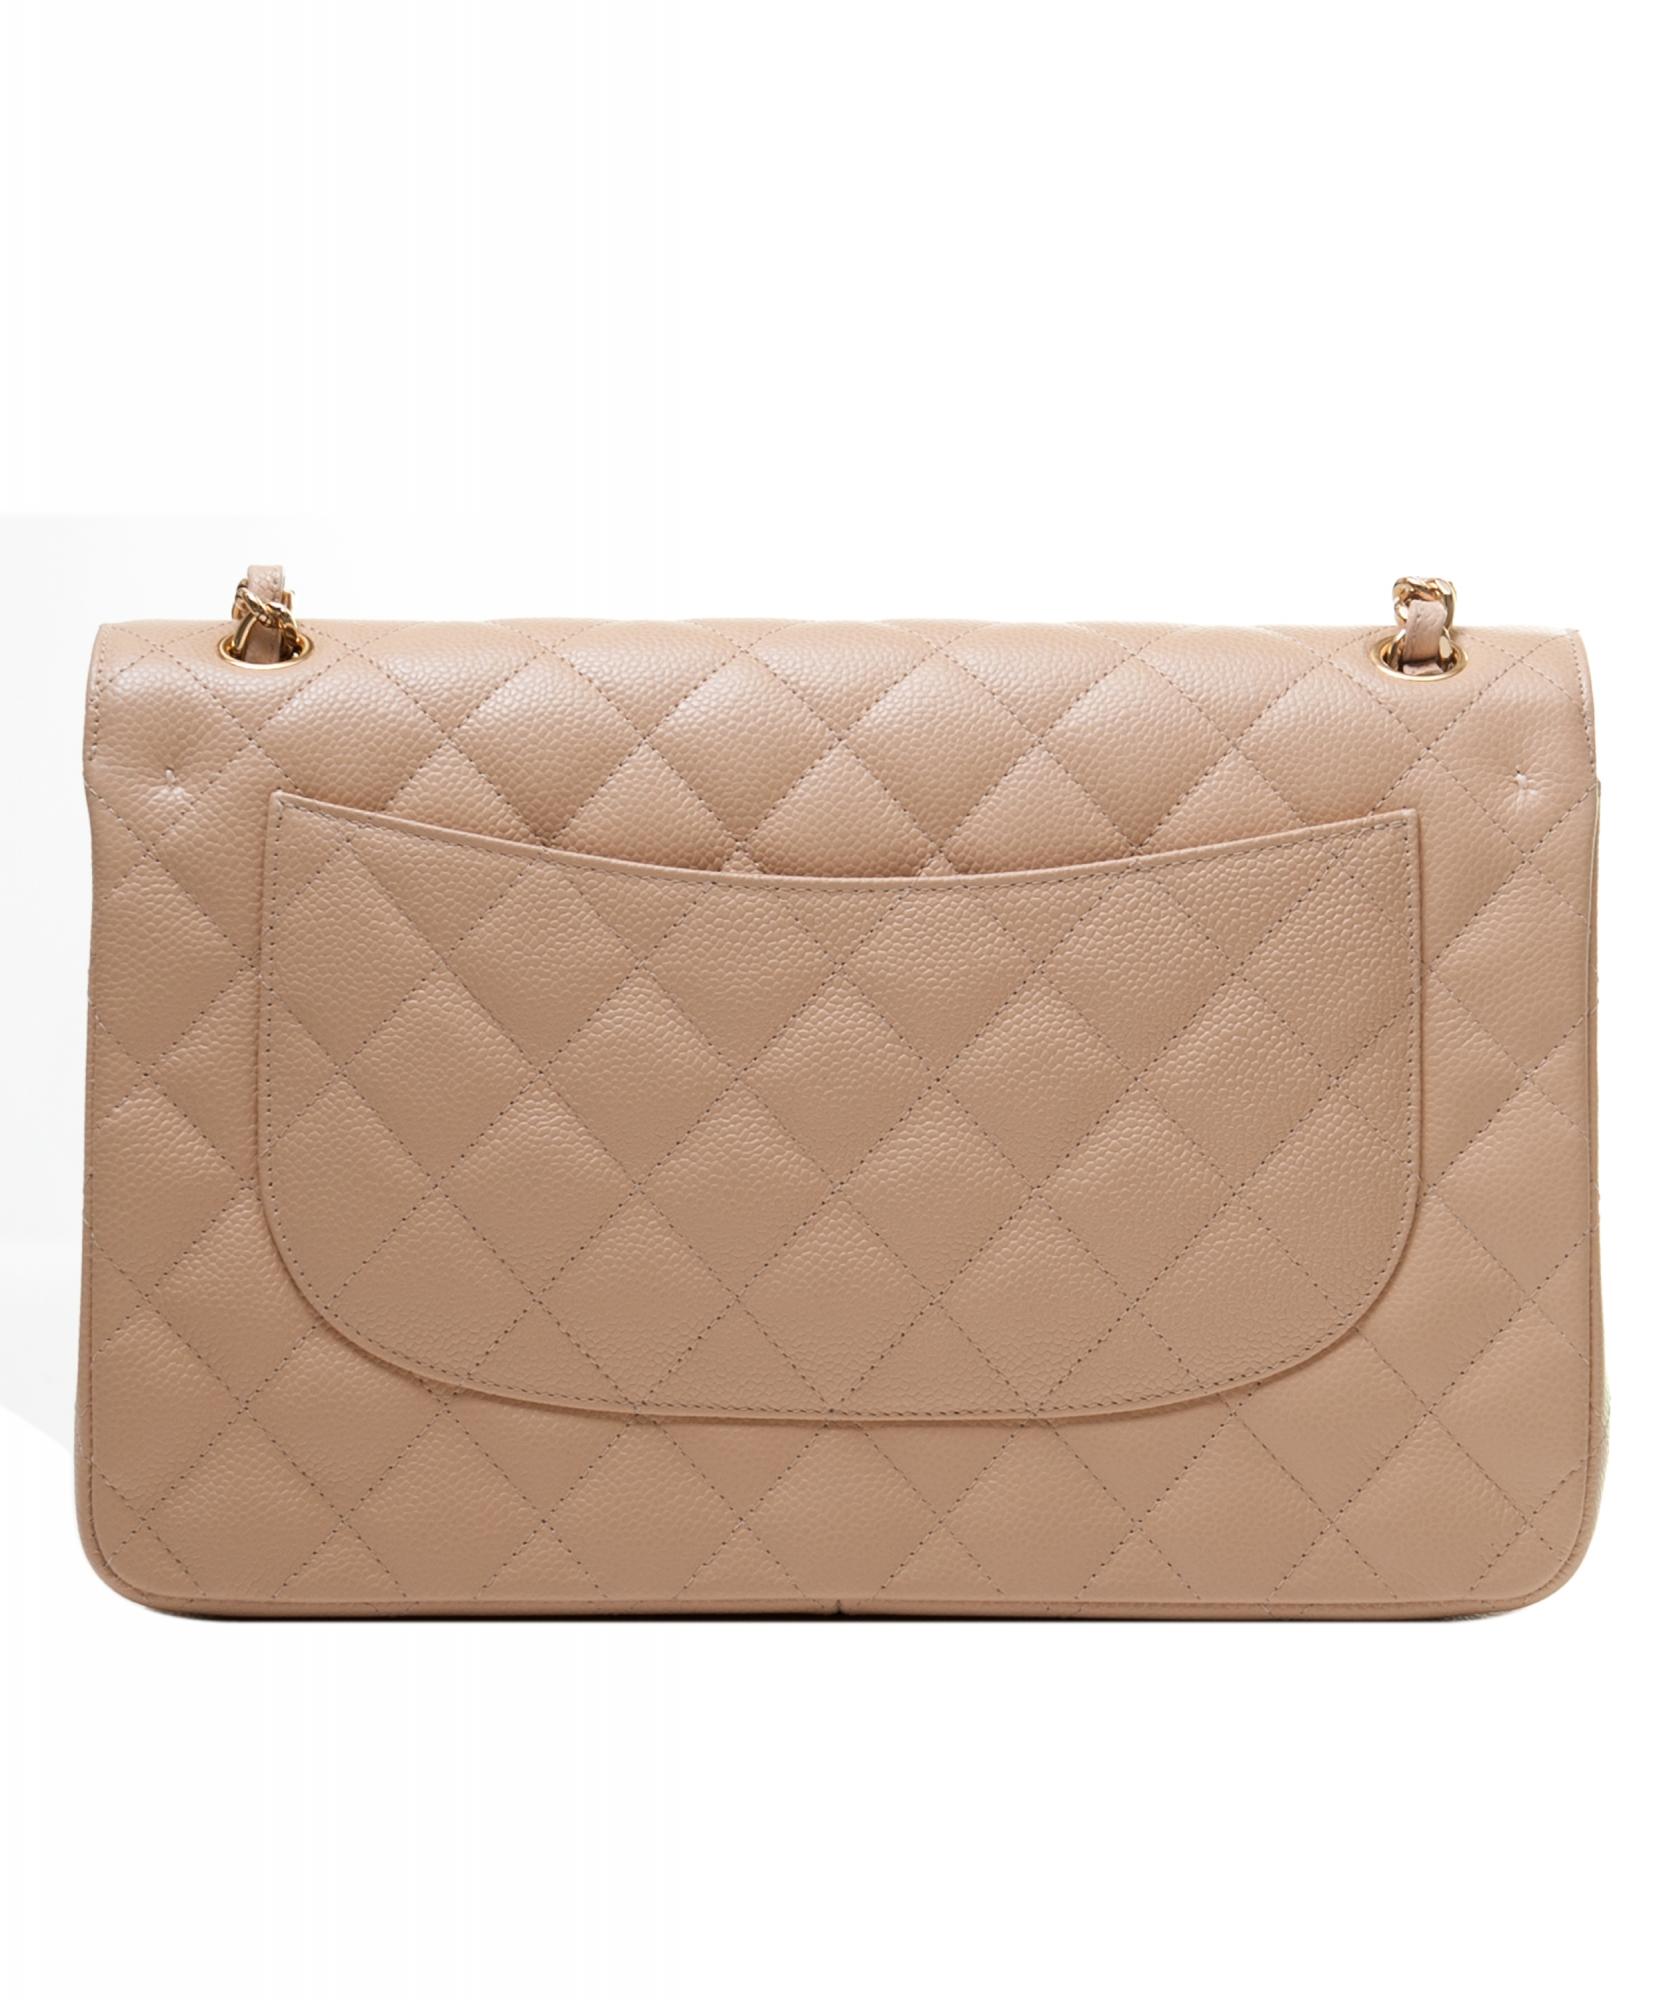 e9641a6cd806 Chanel Jumbo Beige Caviar 2.55 Classic Flap Bag